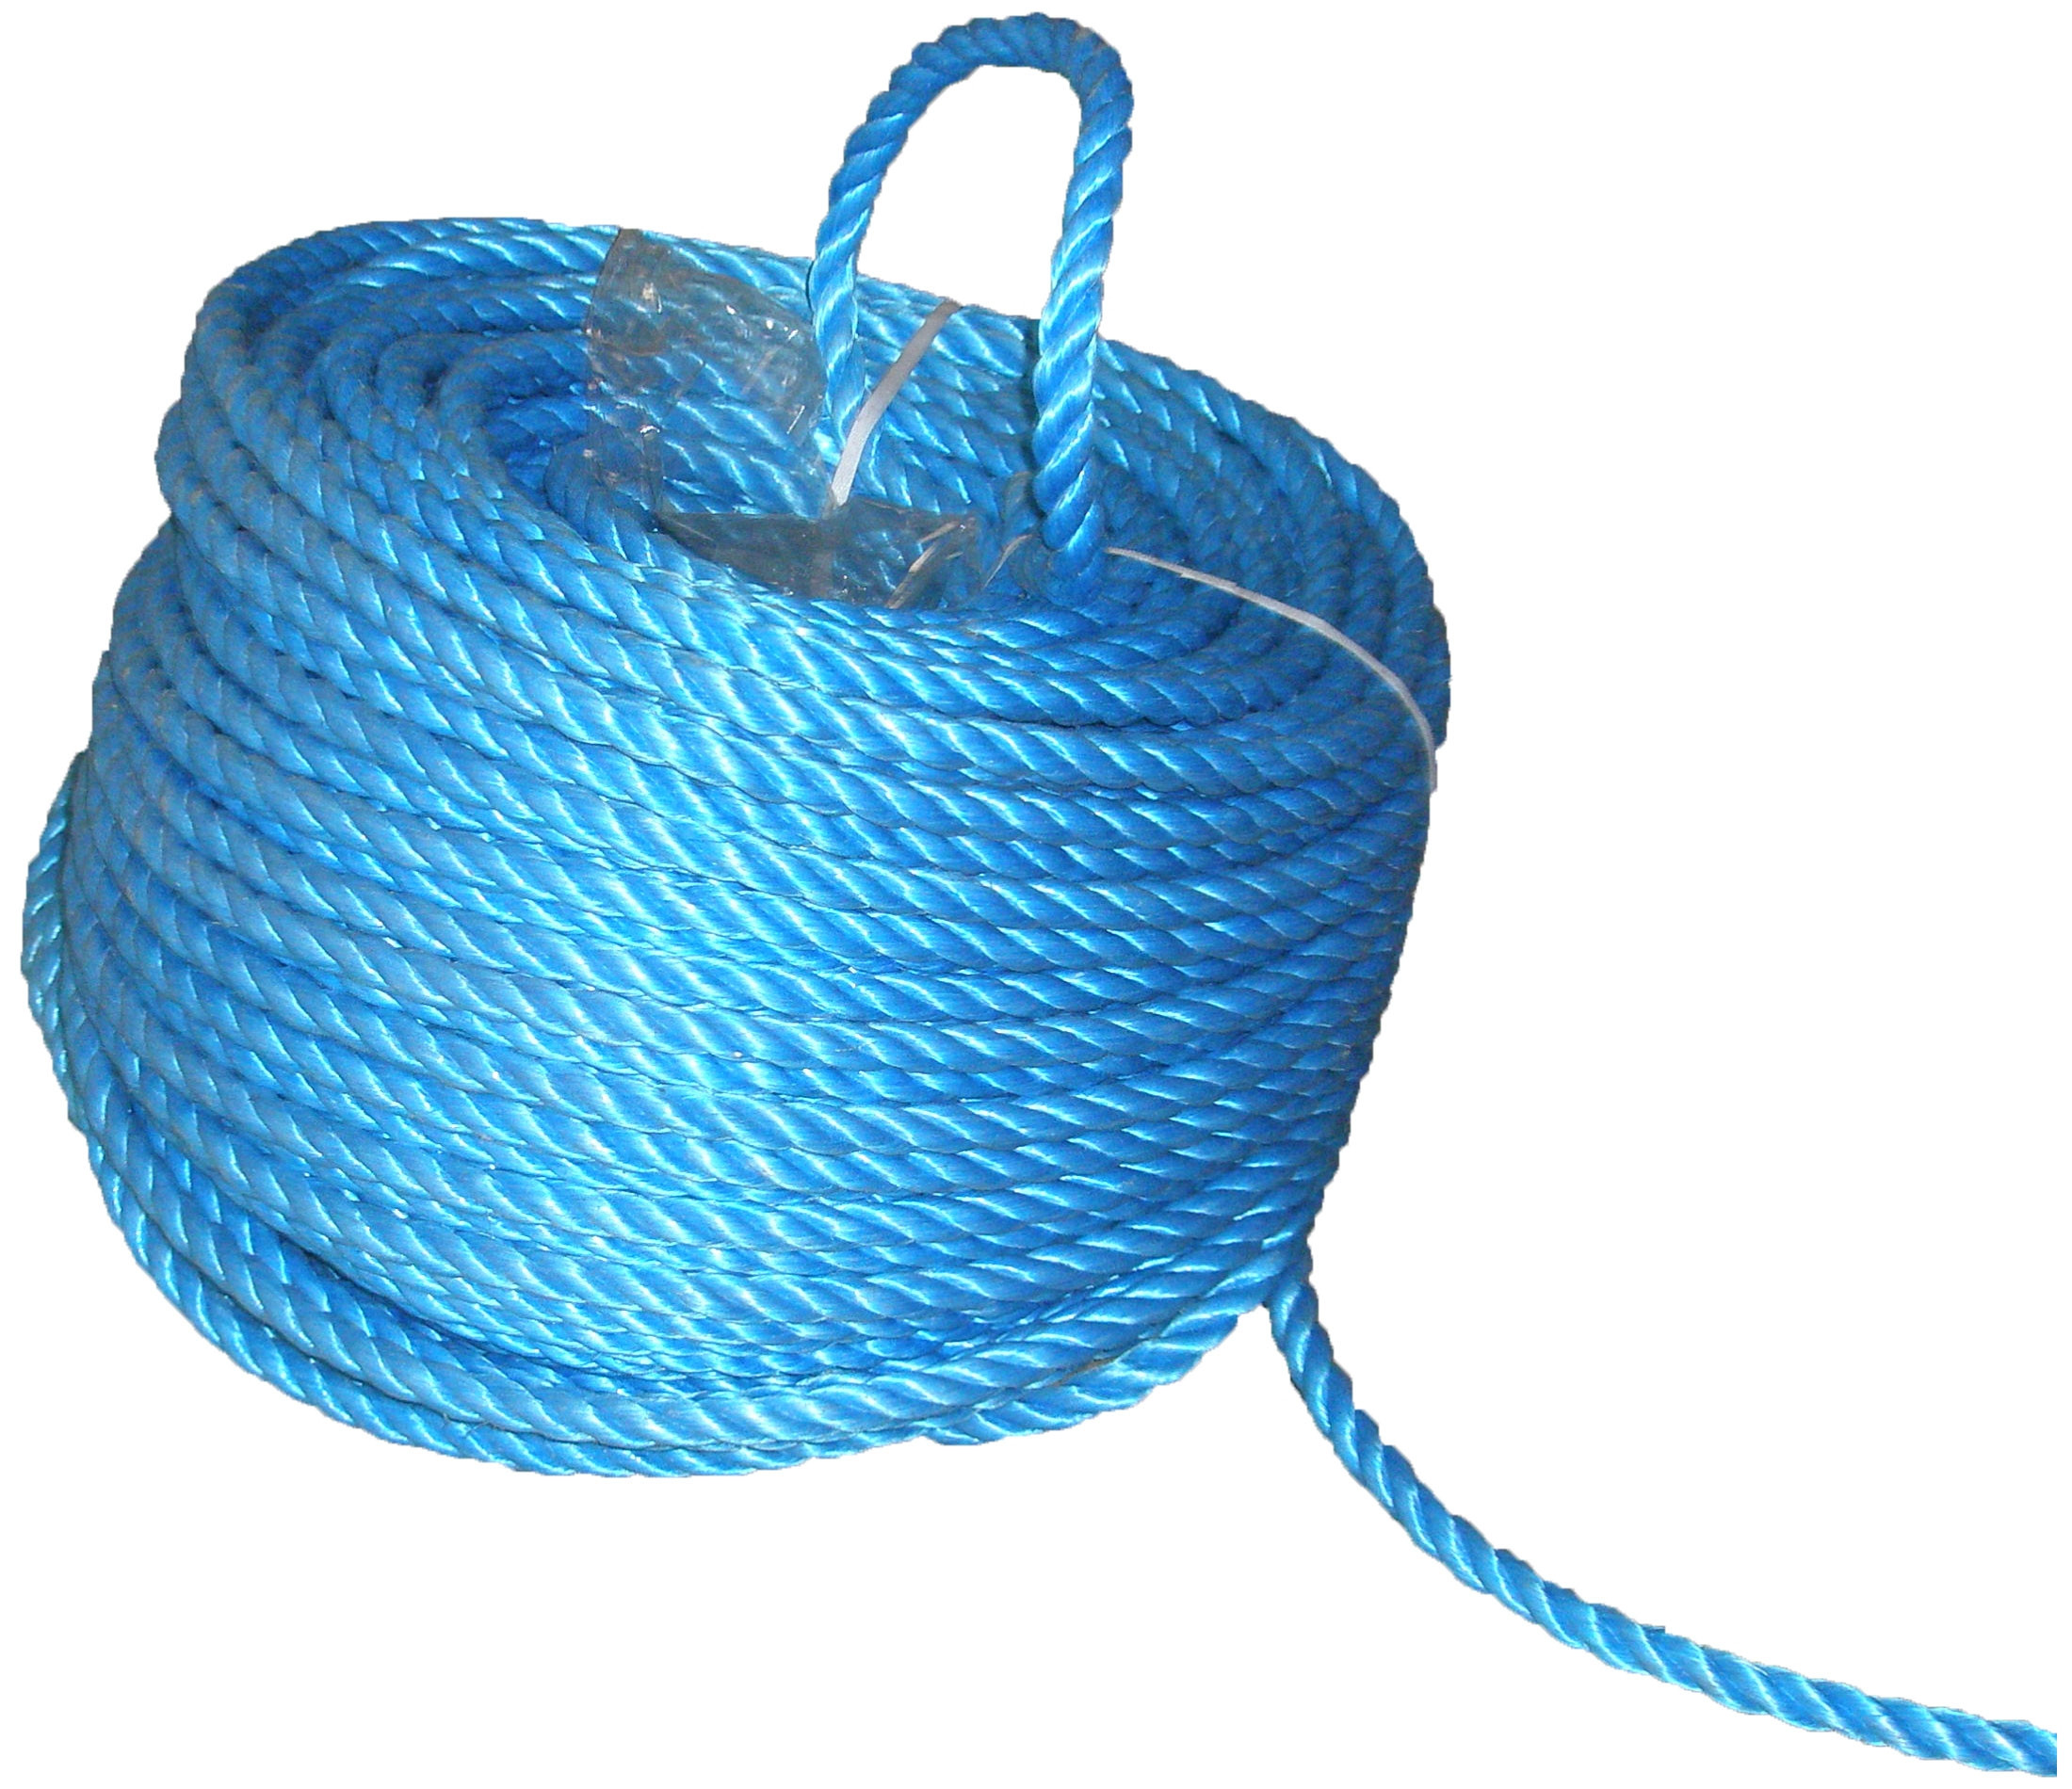 Polypropylene Rope 16mm 220m Coil